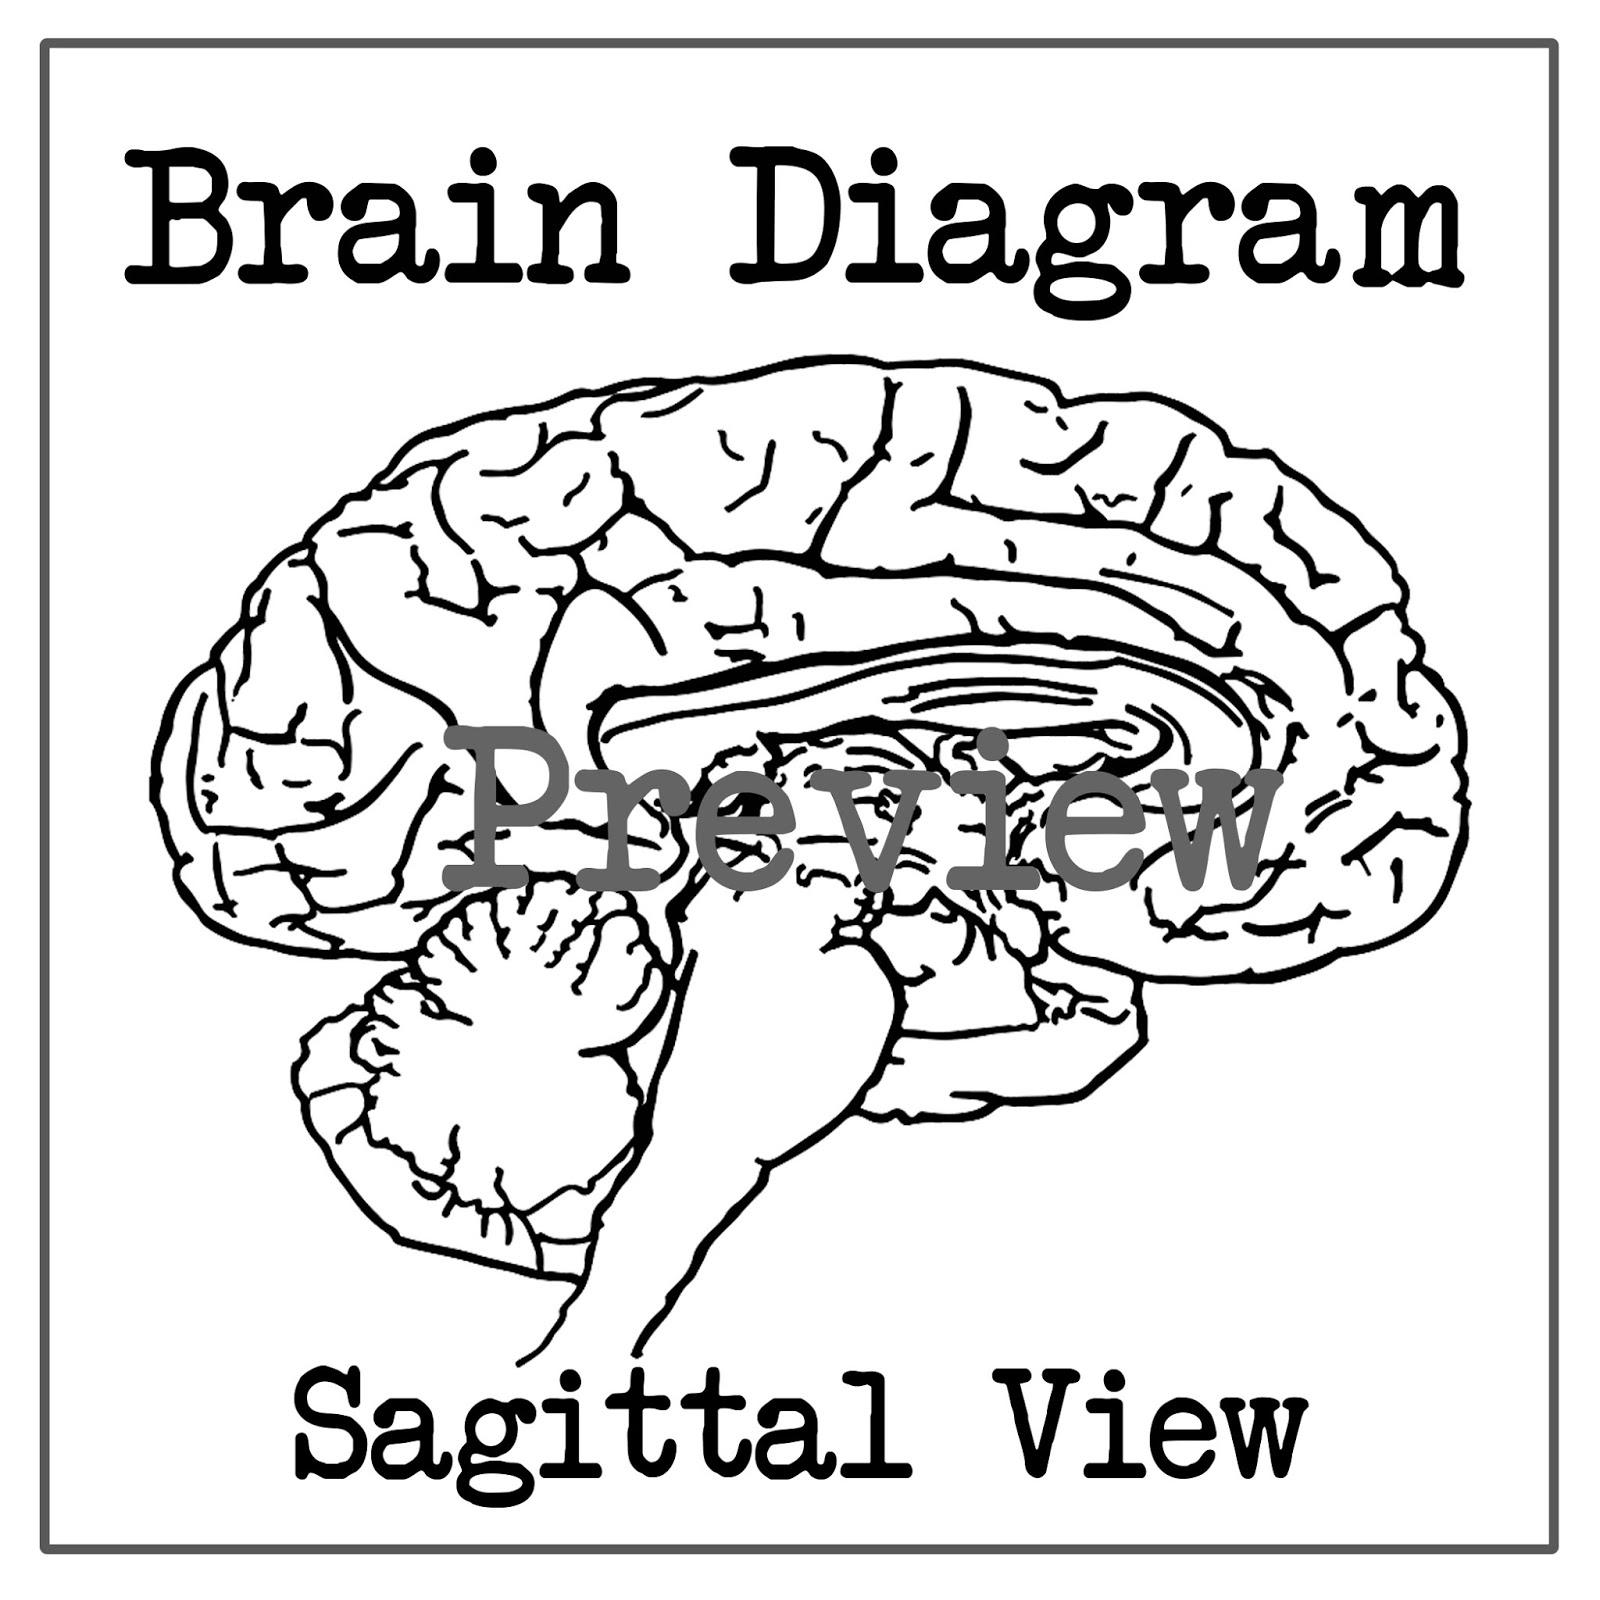 Blank Brain Diagram Sagittal